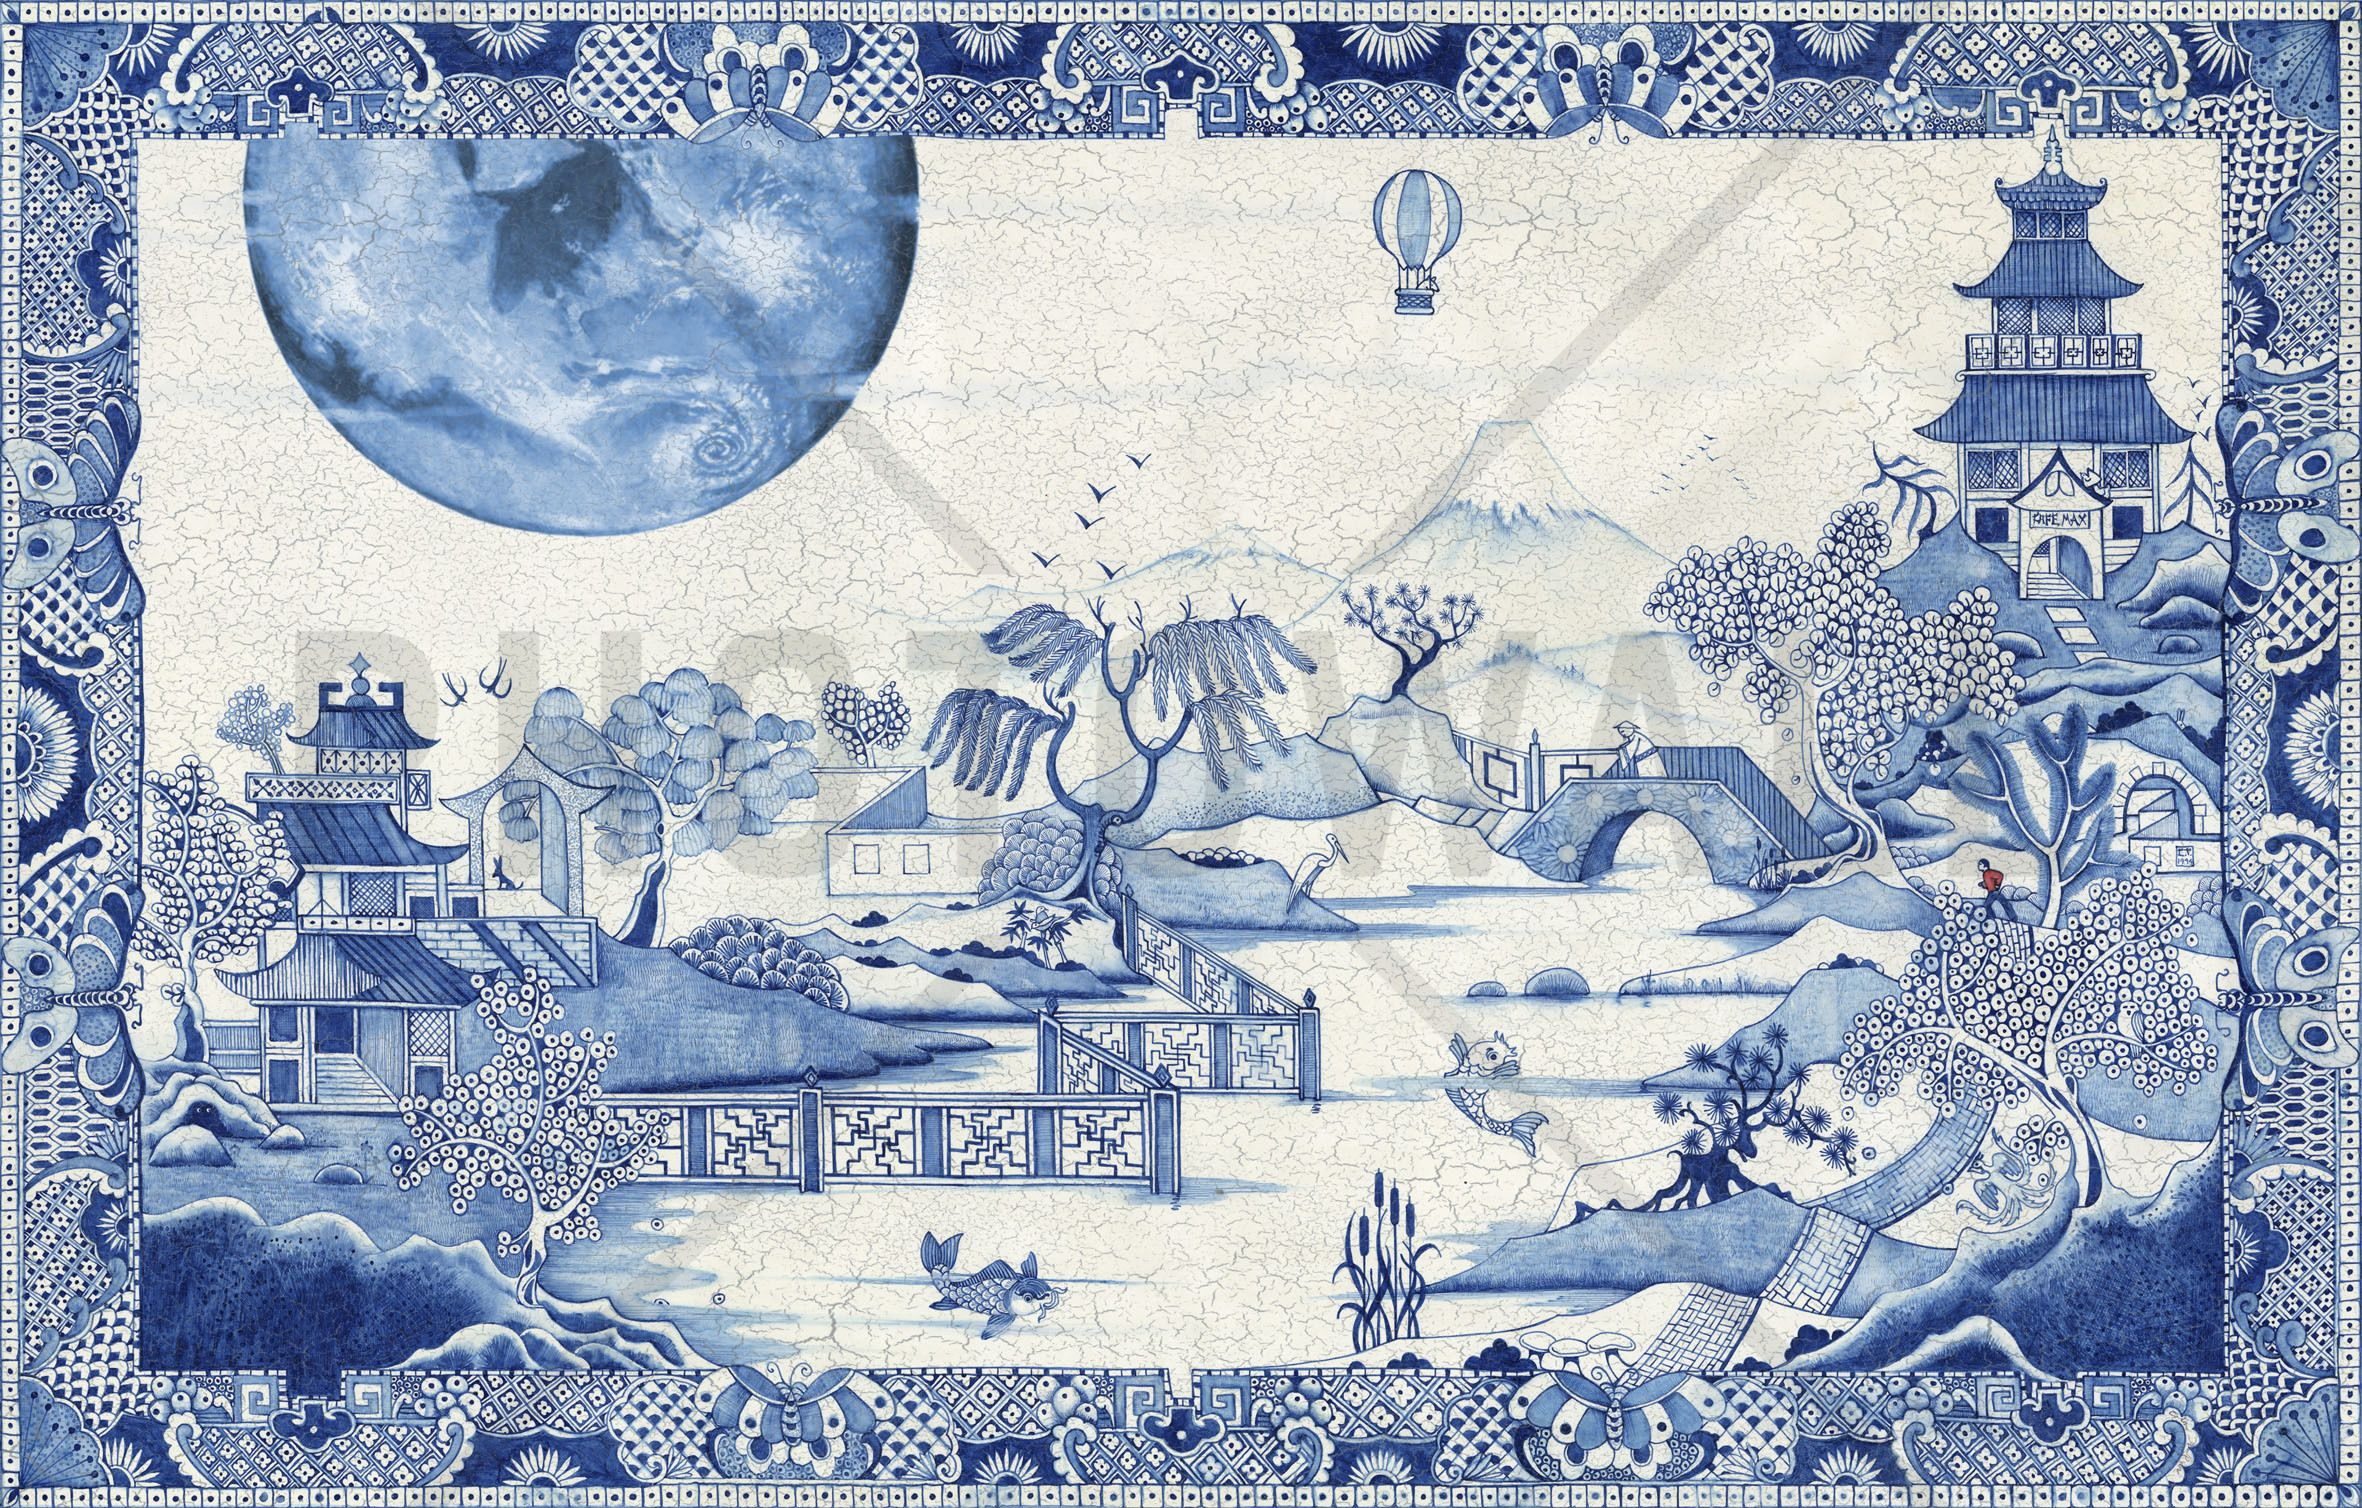 Blue moon crazed wall mural u photo wallpaper photowall dream